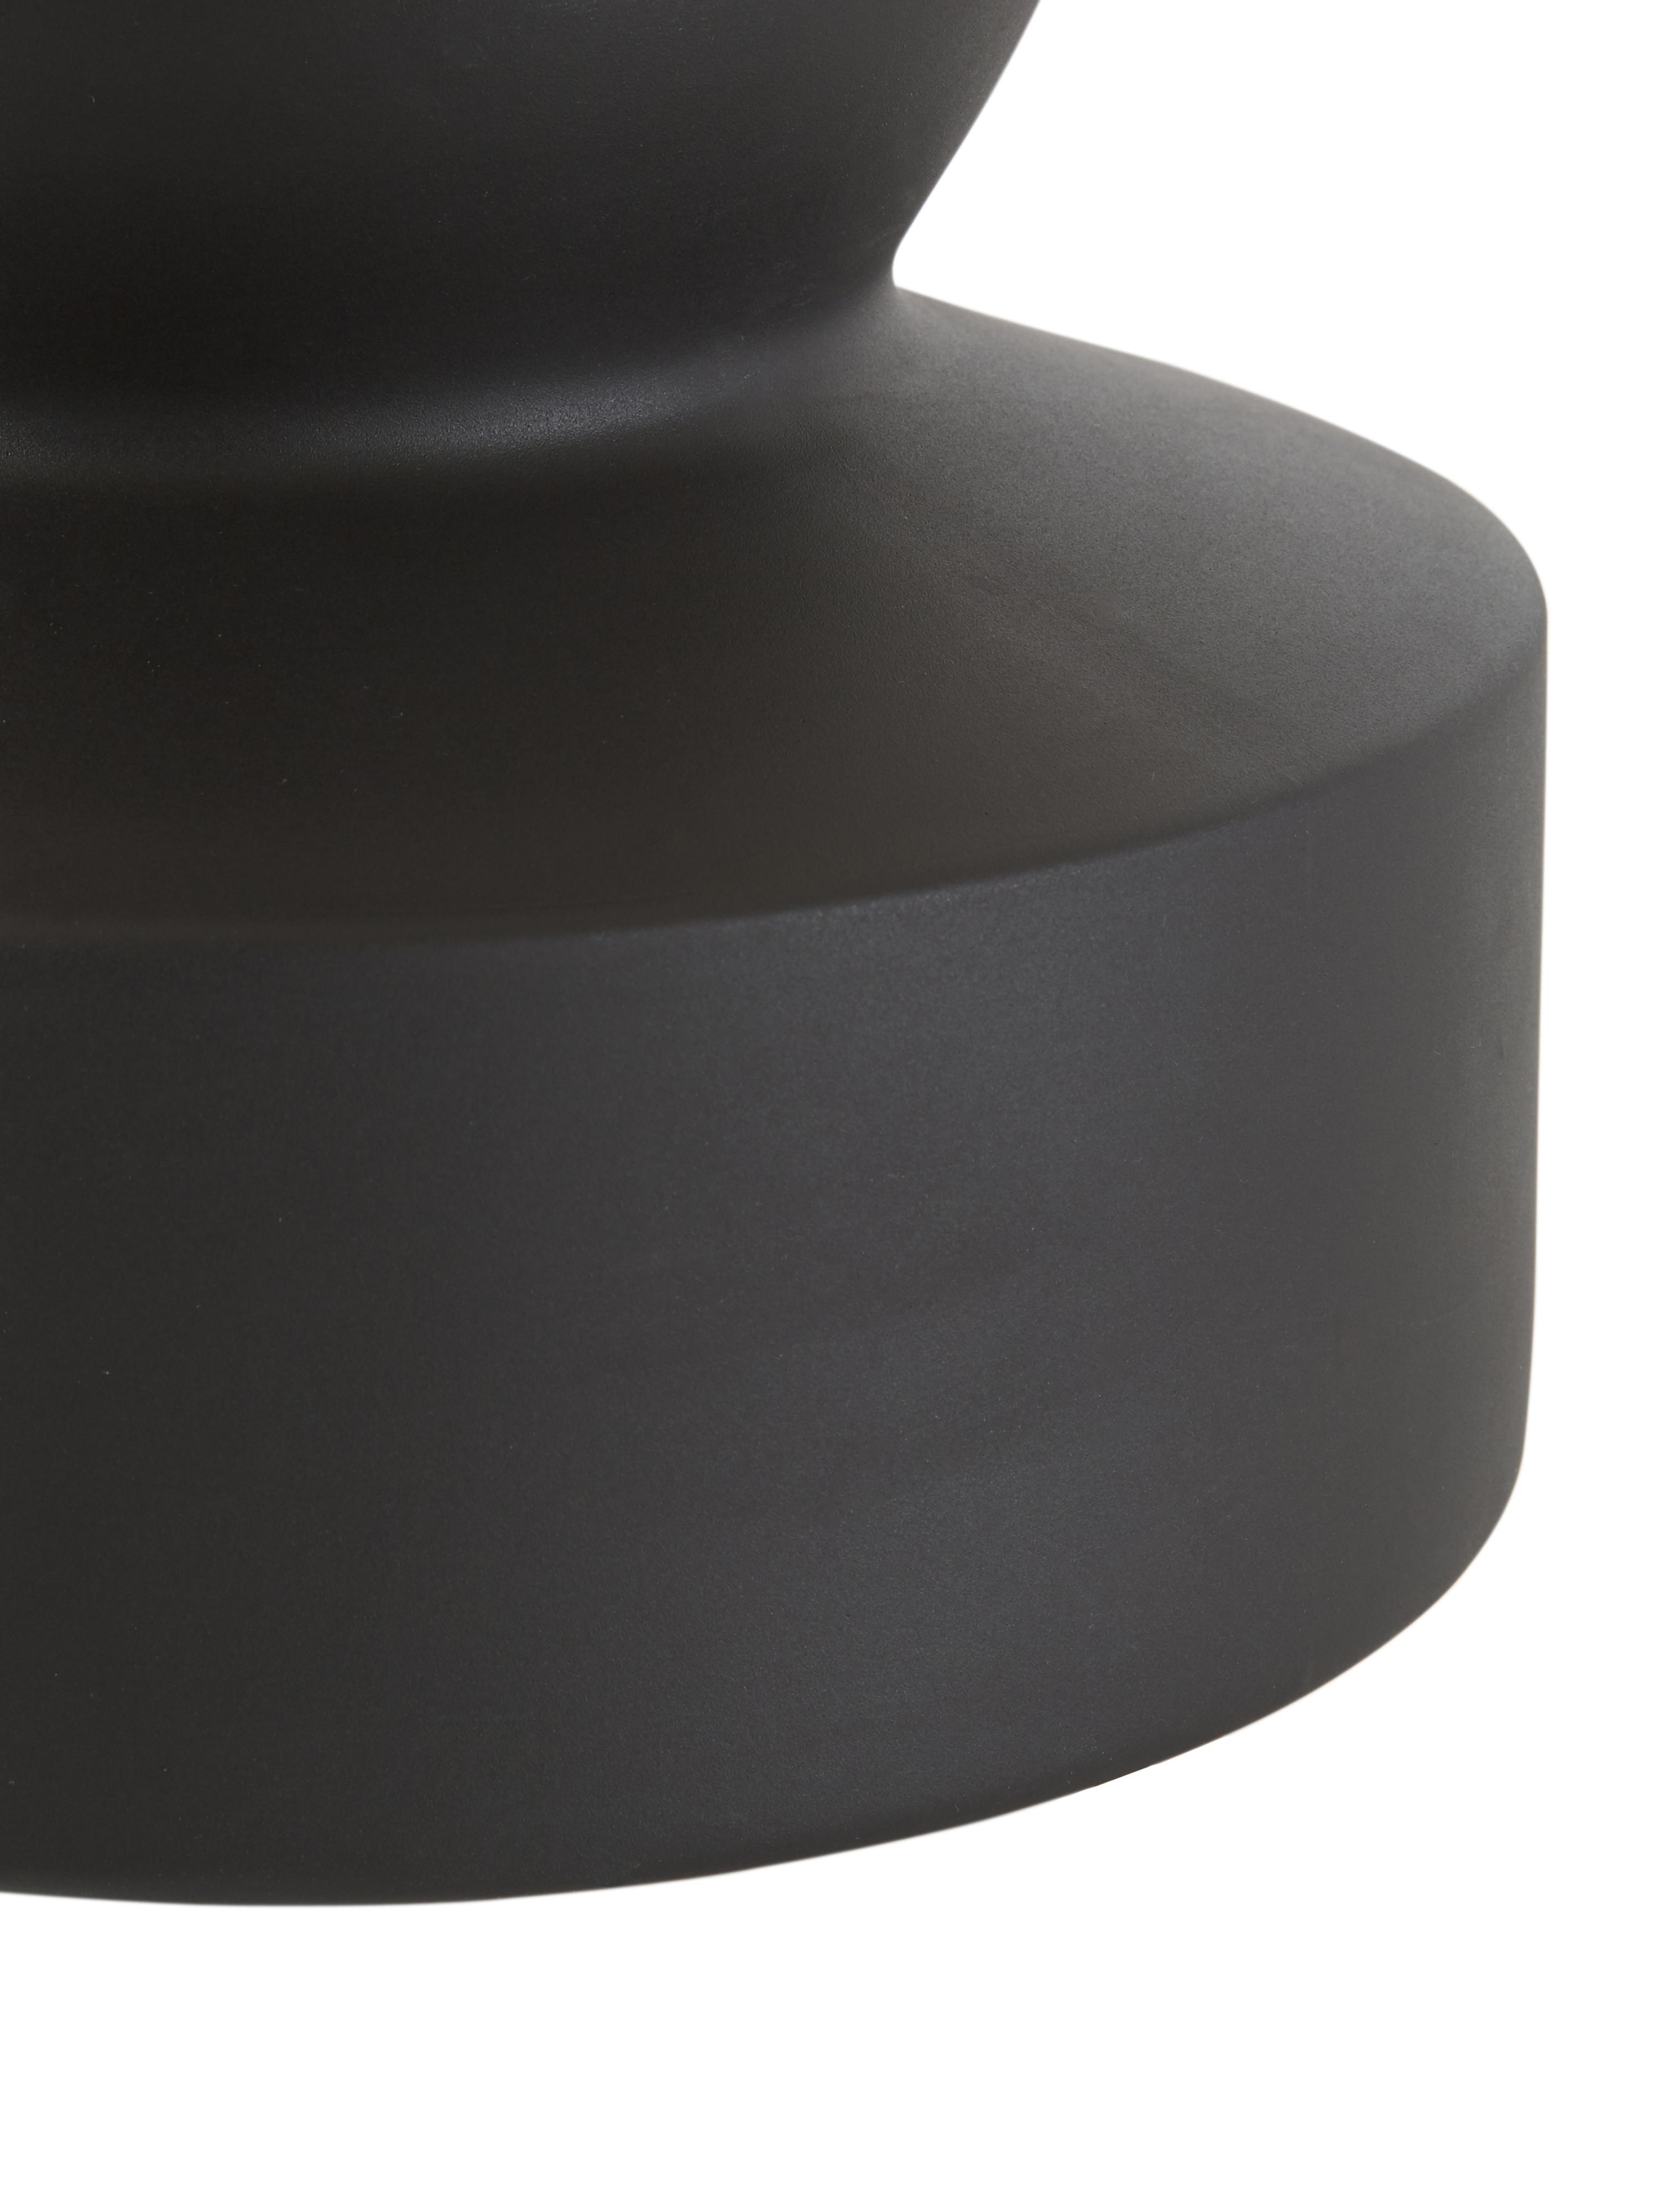 Keramik-Tischlampe Georgina, Lampenschirm: Textil, Lampenfuß: Keramik, Dekor: Metall, vermessingt, Beige, Schwarz, Ø 33 x H 52 cm